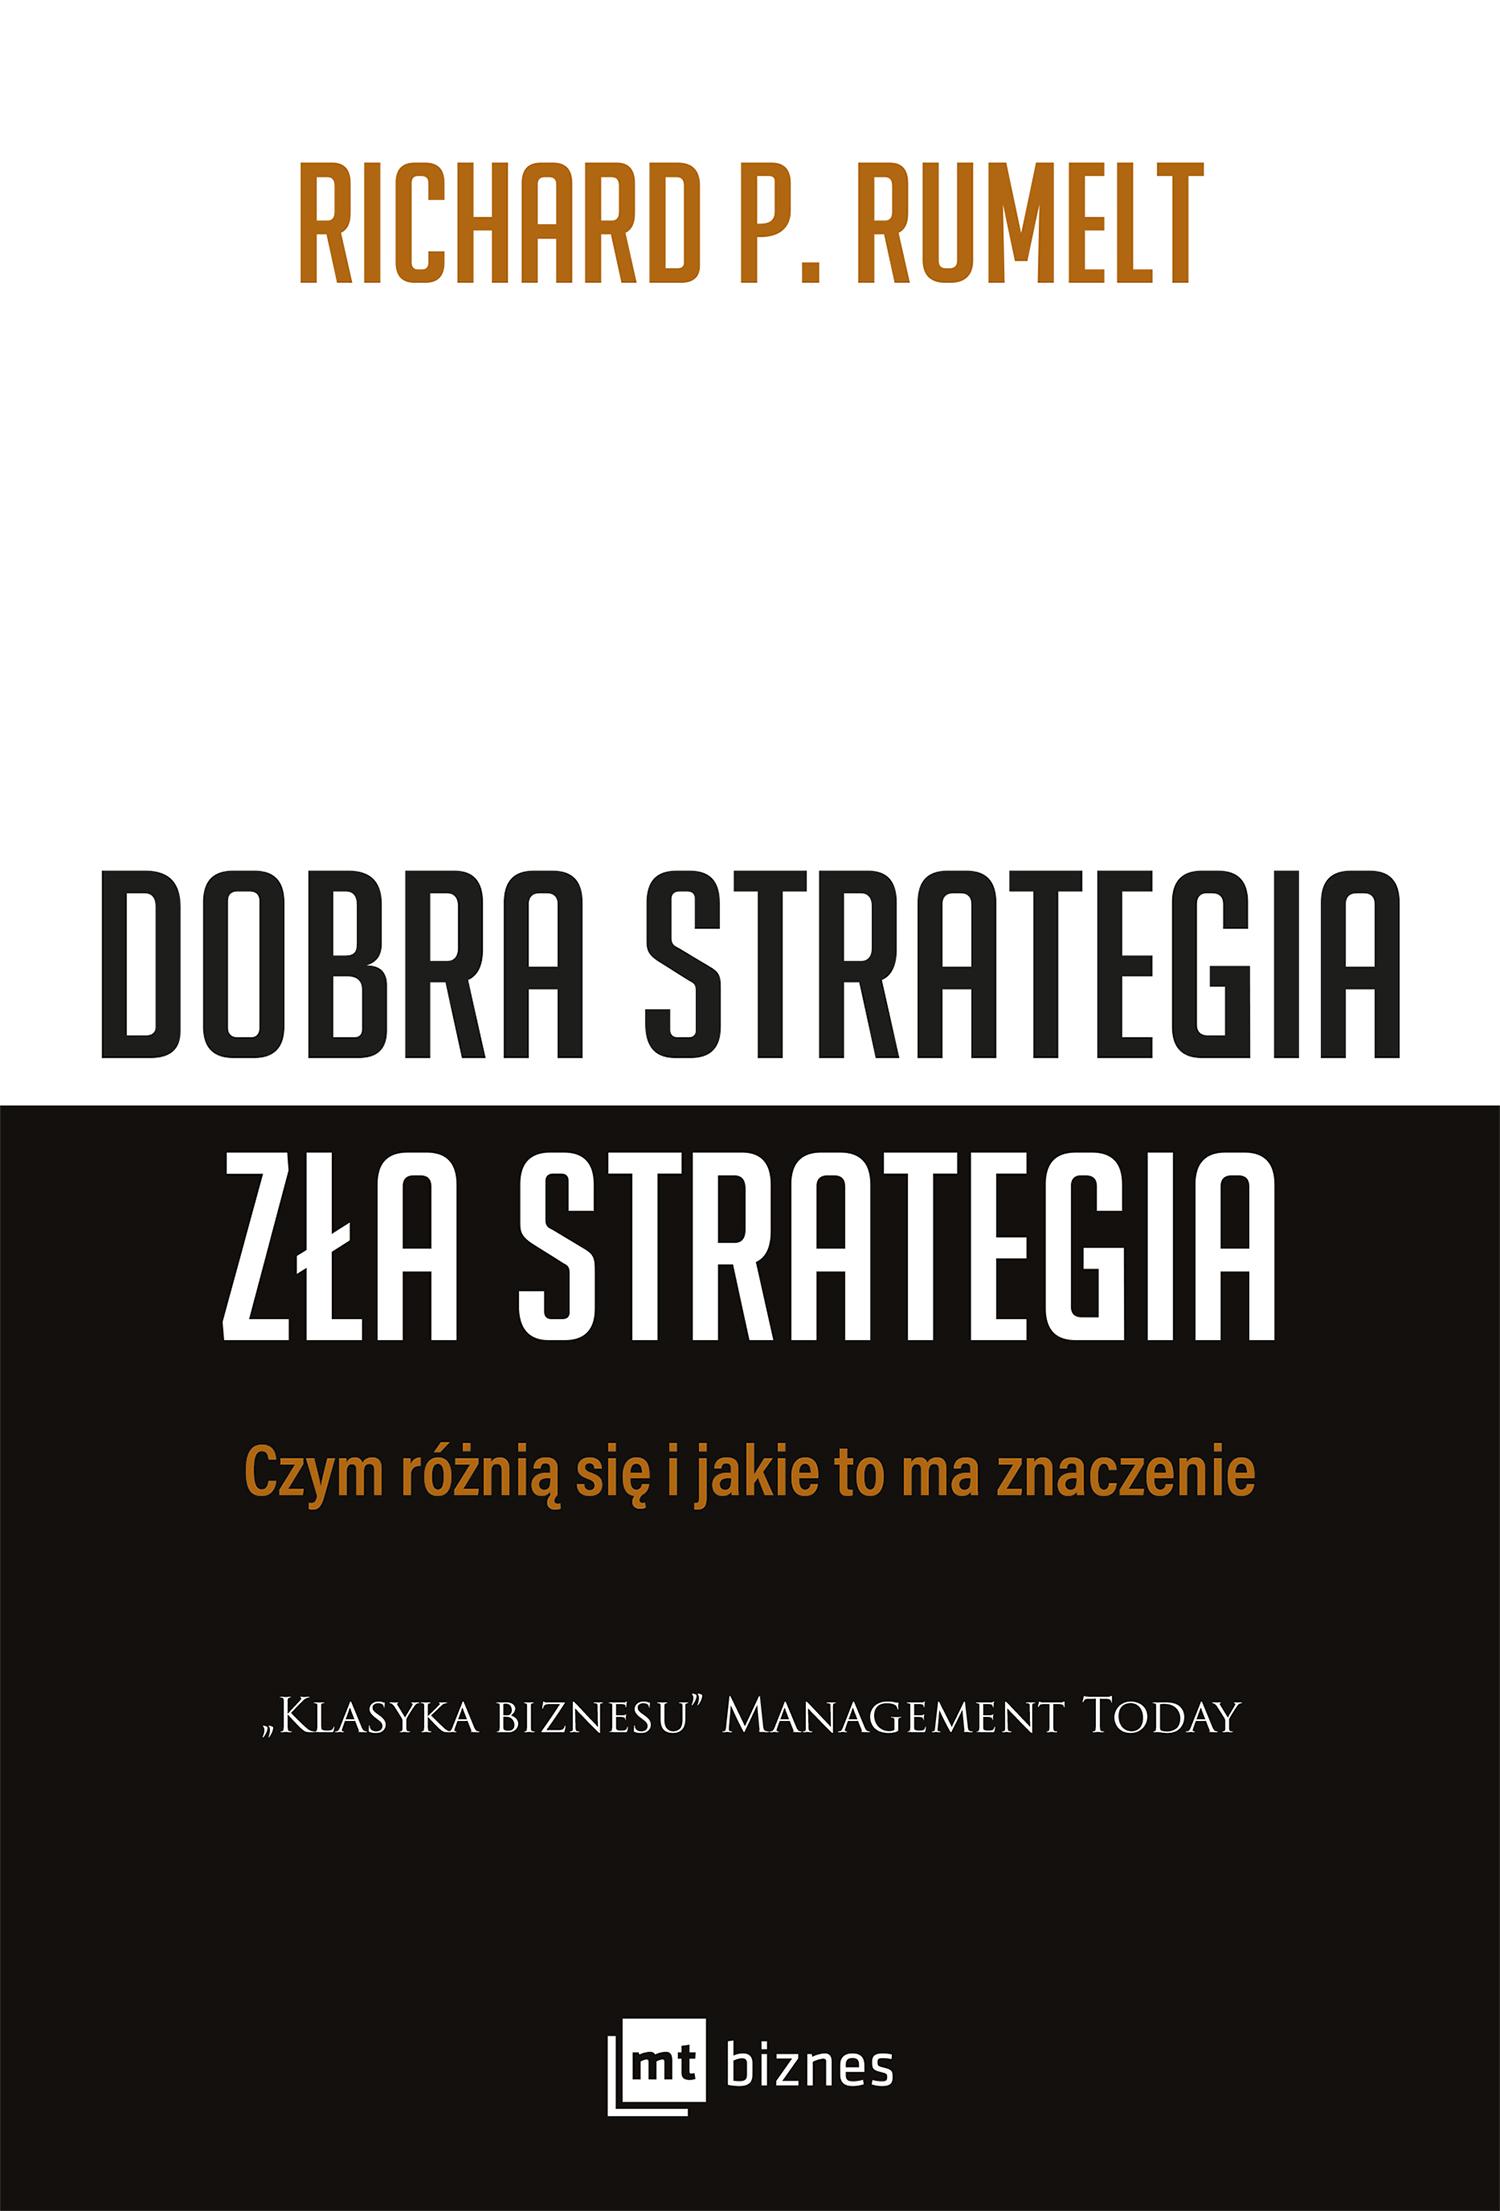 Dobra strategia zła strategia